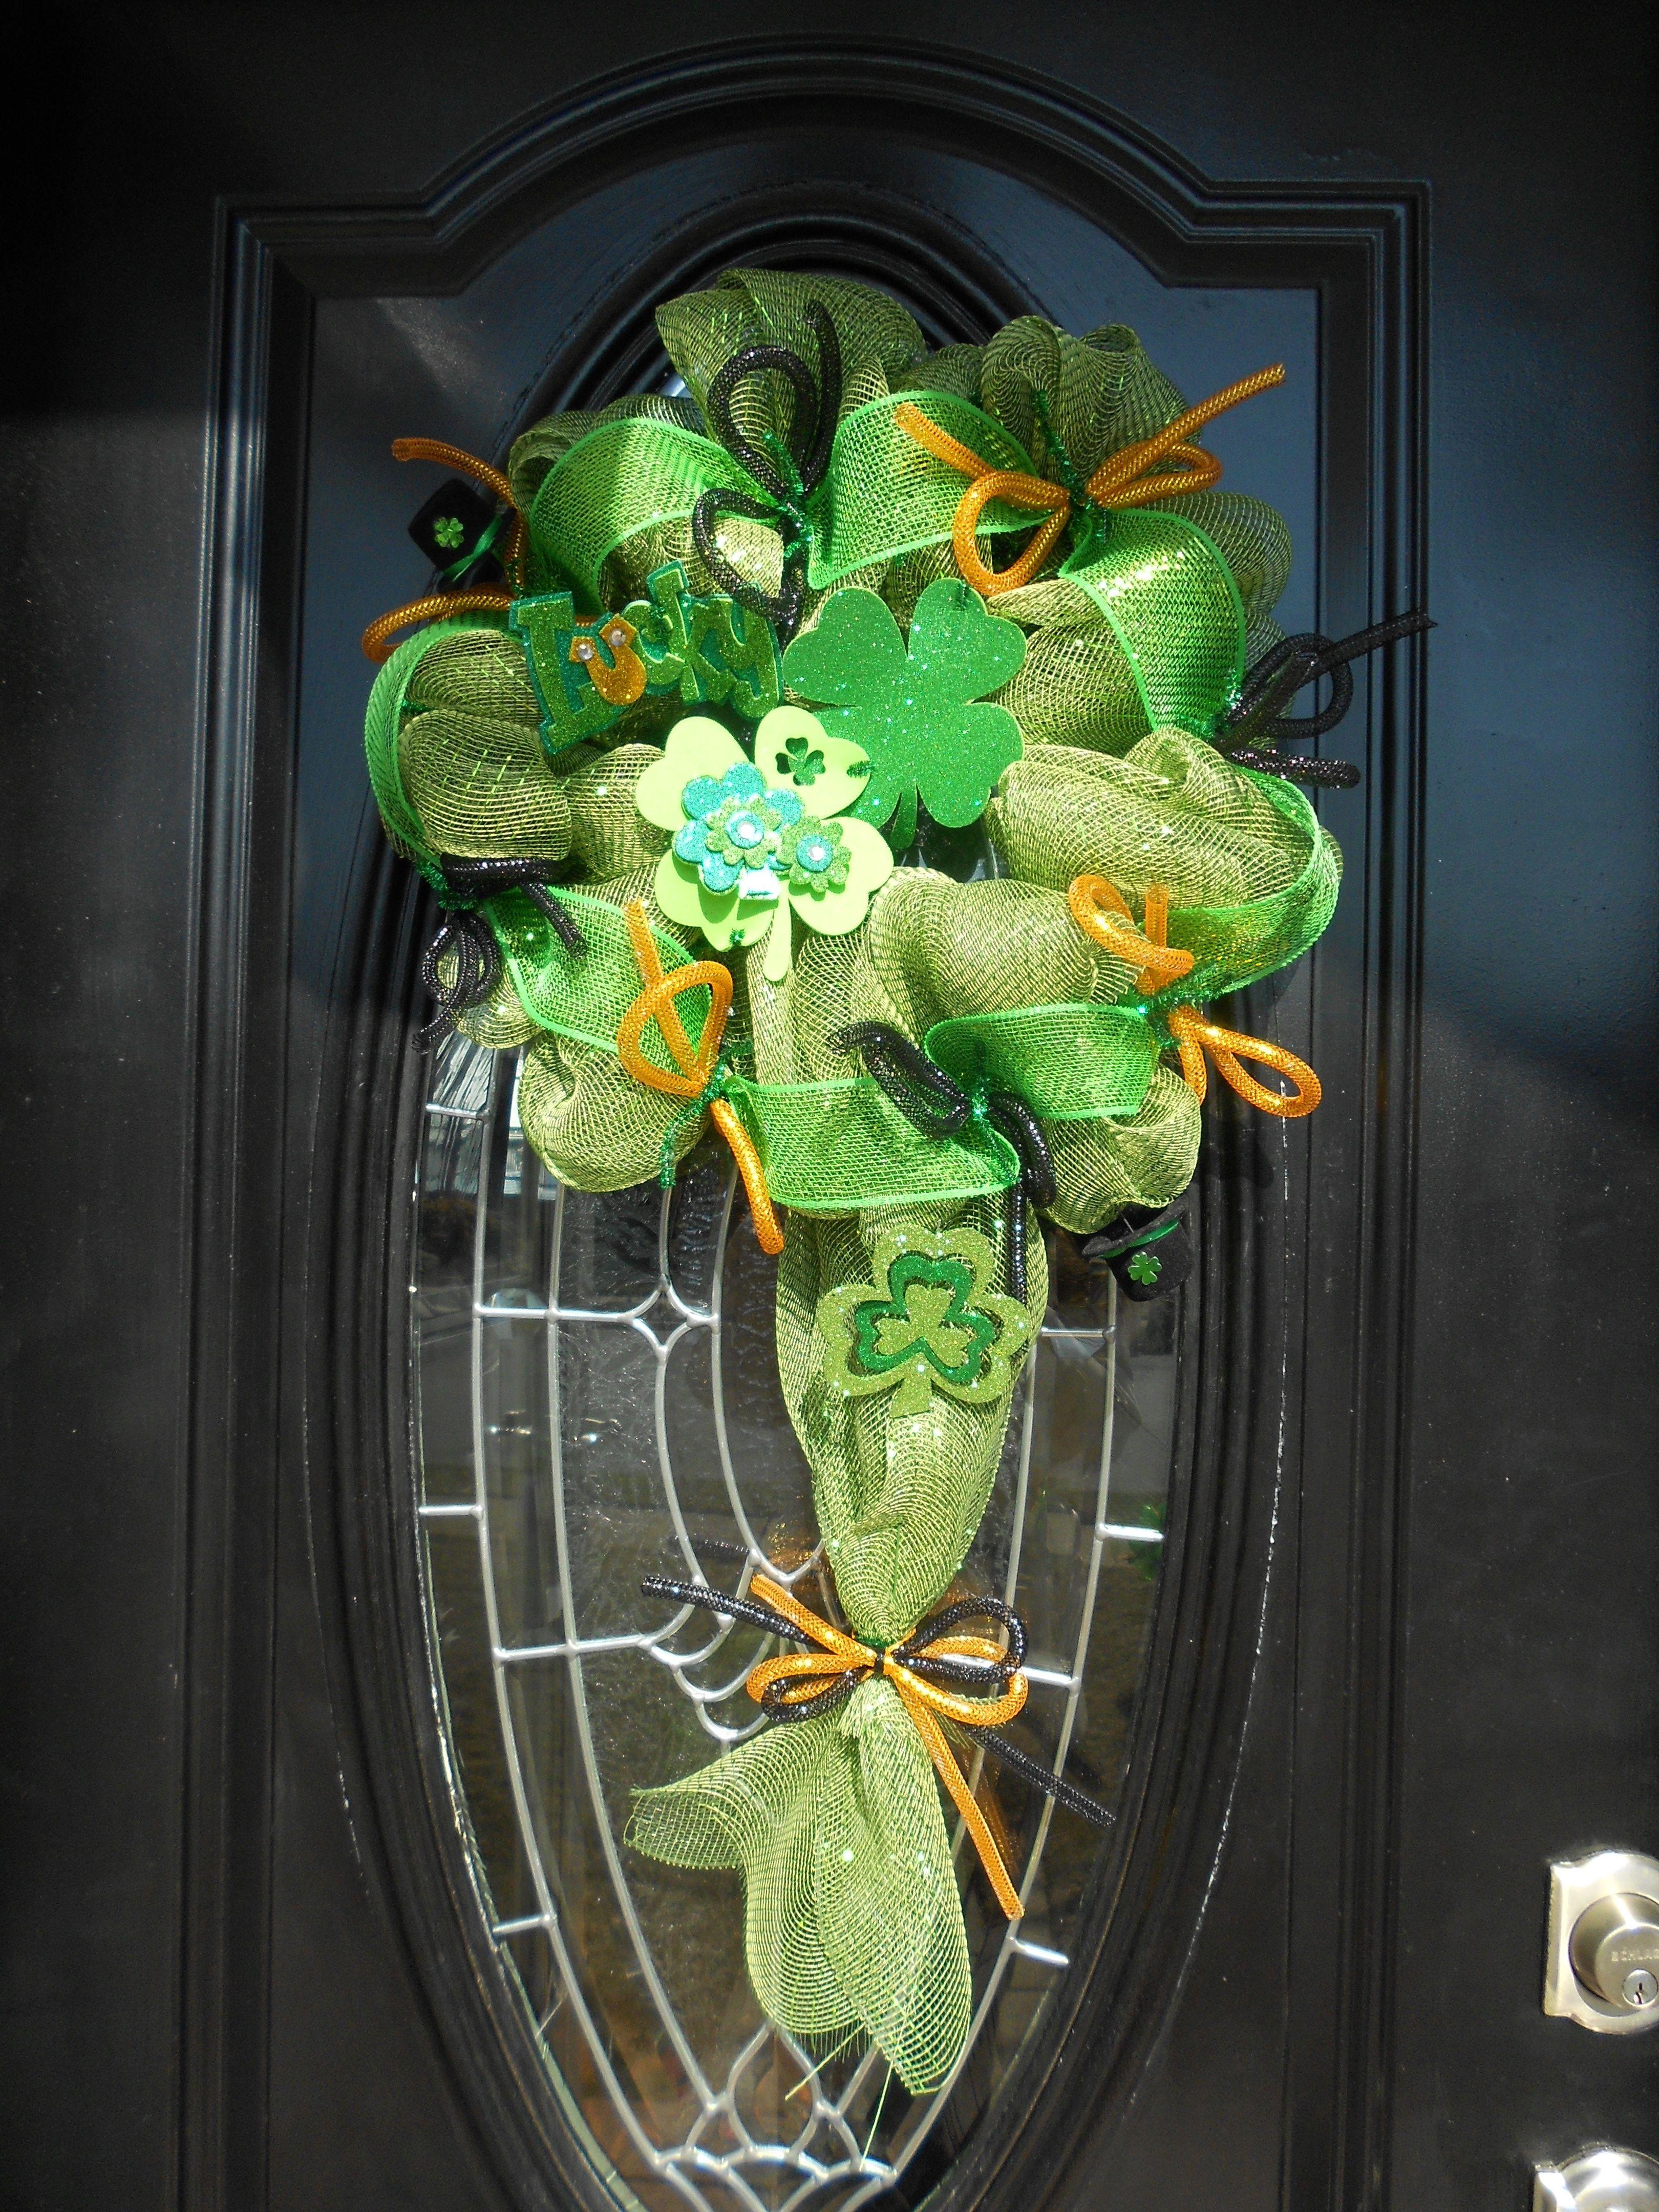 st patrick 39 s day deco mesh wreath roezee 39 s wreaths pinterest wreaths deco mesh wreaths. Black Bedroom Furniture Sets. Home Design Ideas